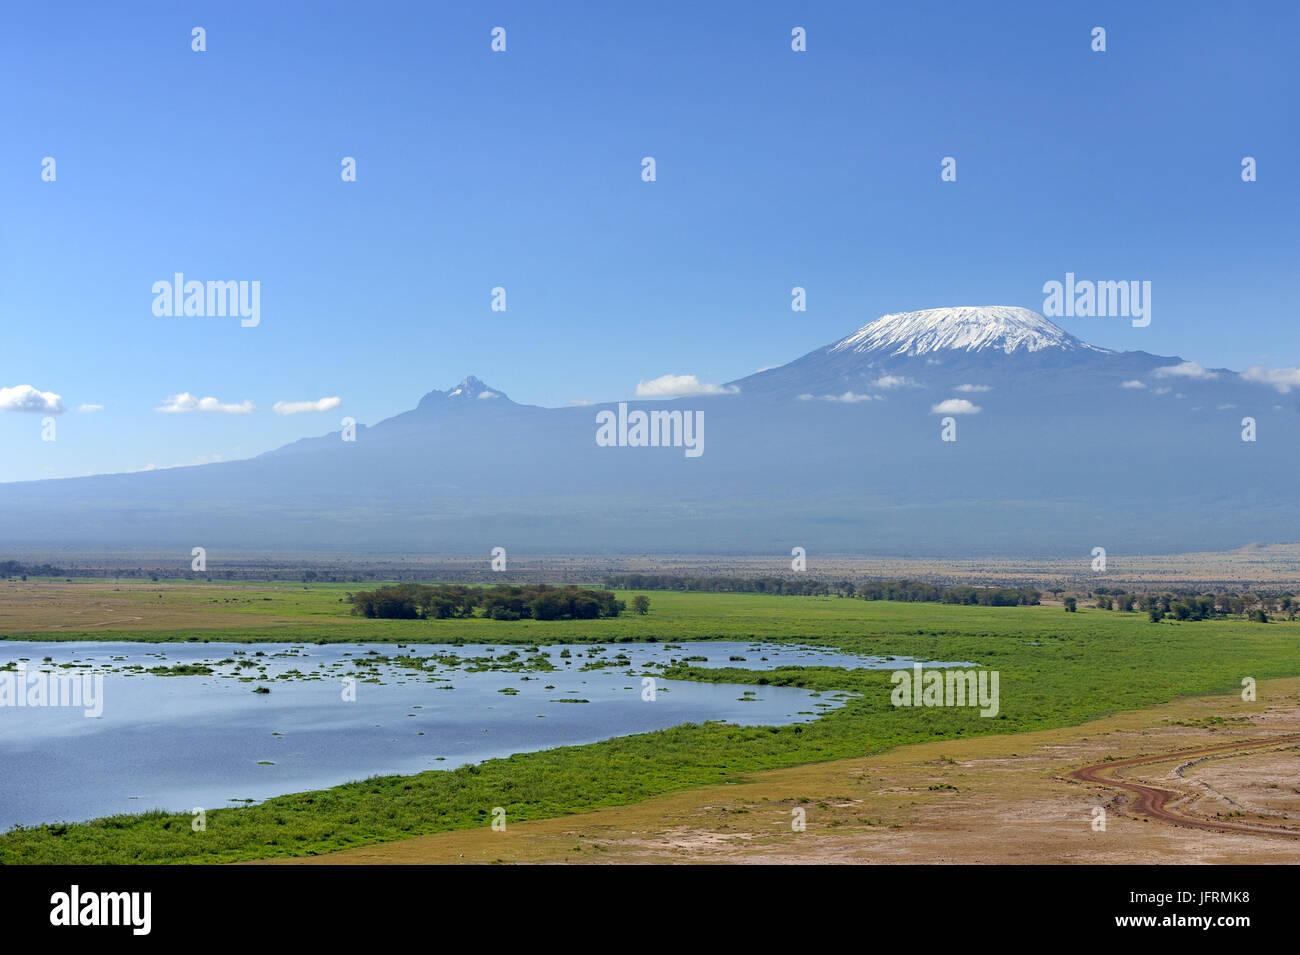 Snow on top of Mount Kilimanjaro in Amboseli - Stock Image